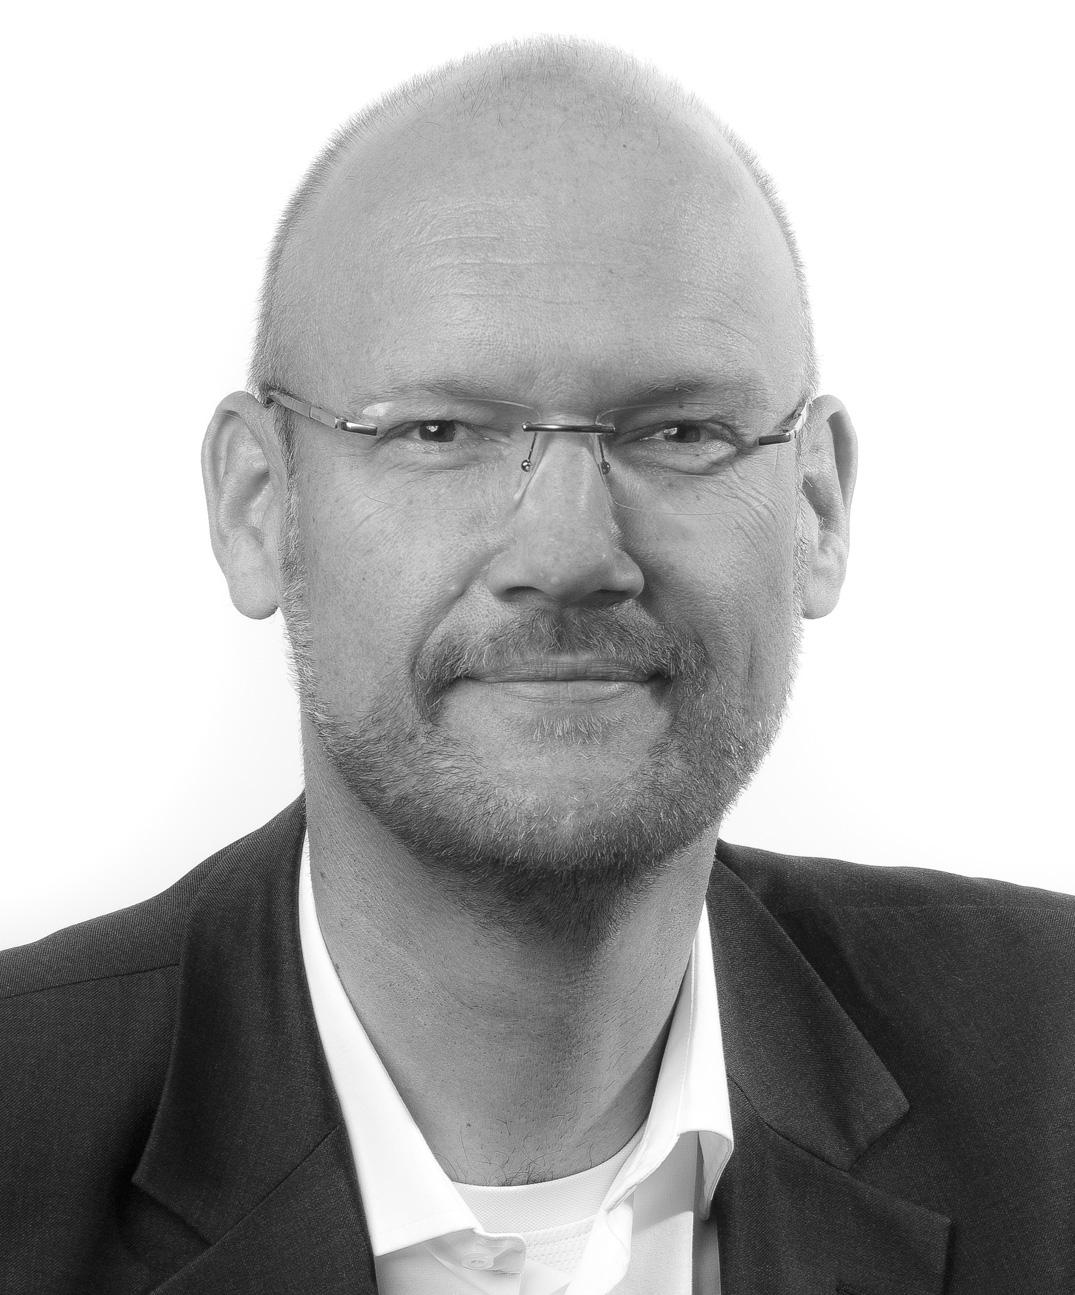 Walter-Koch_Mvideo_bw